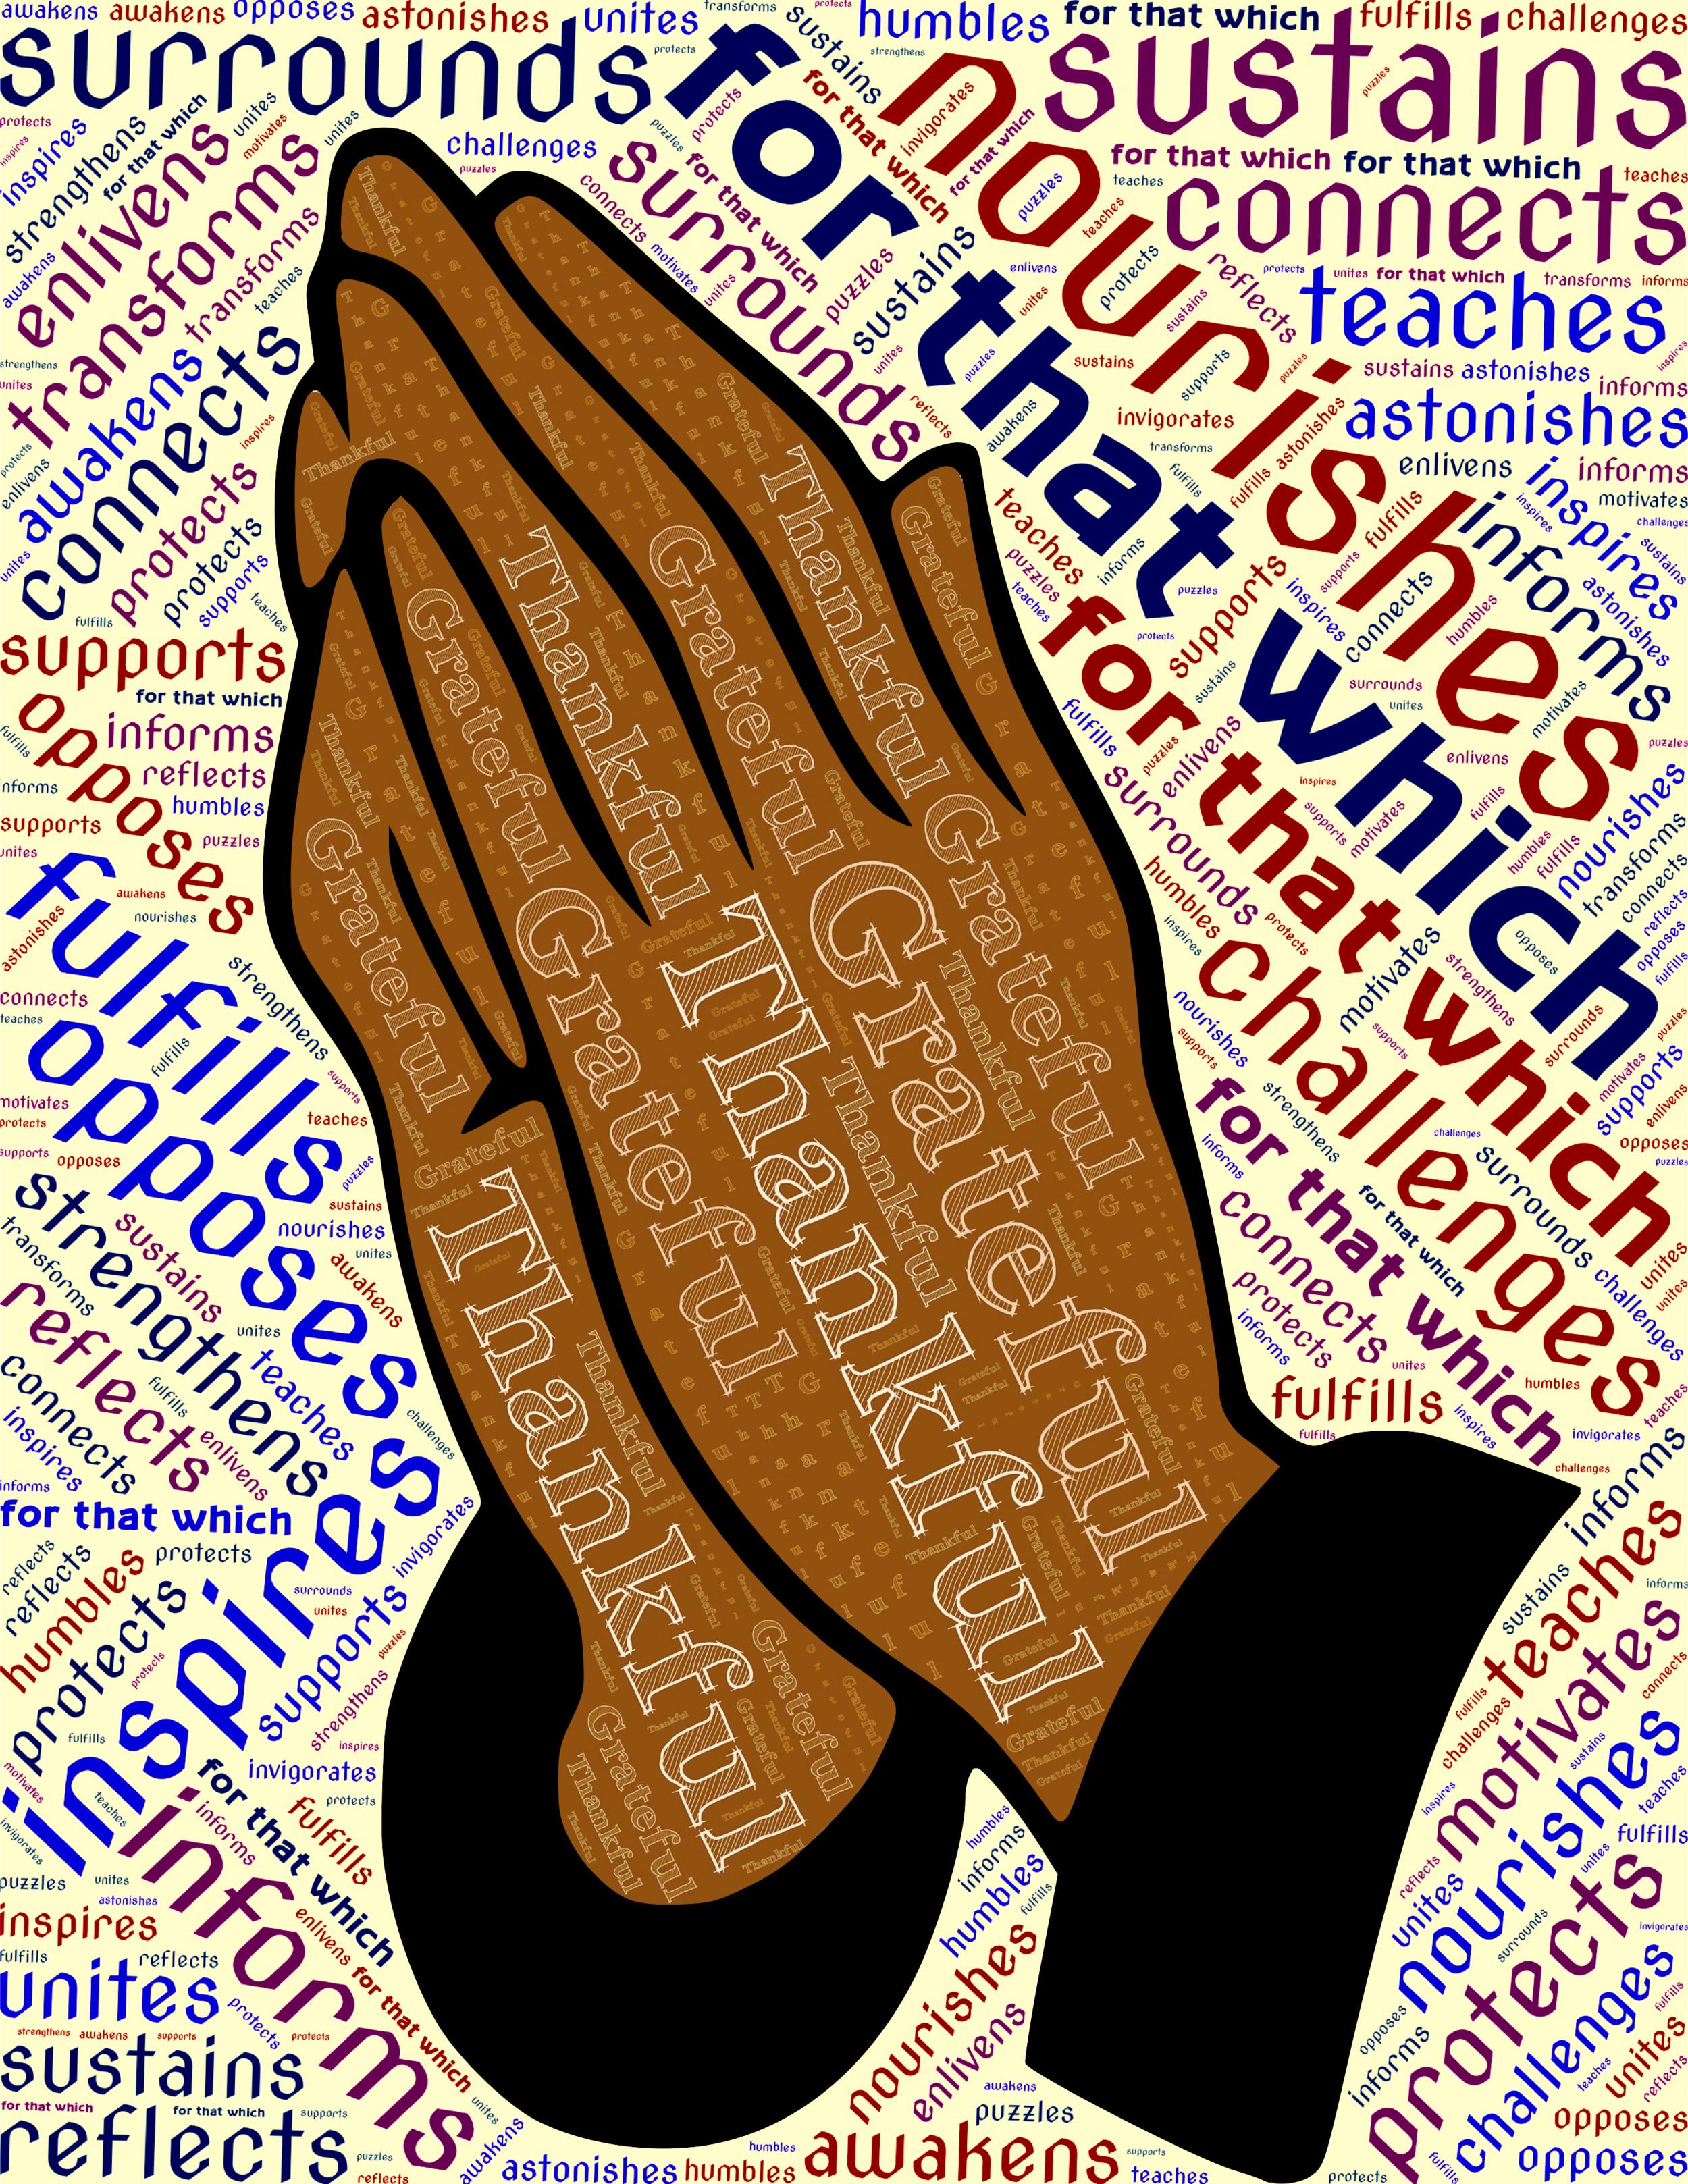 Gratitude Nourishes